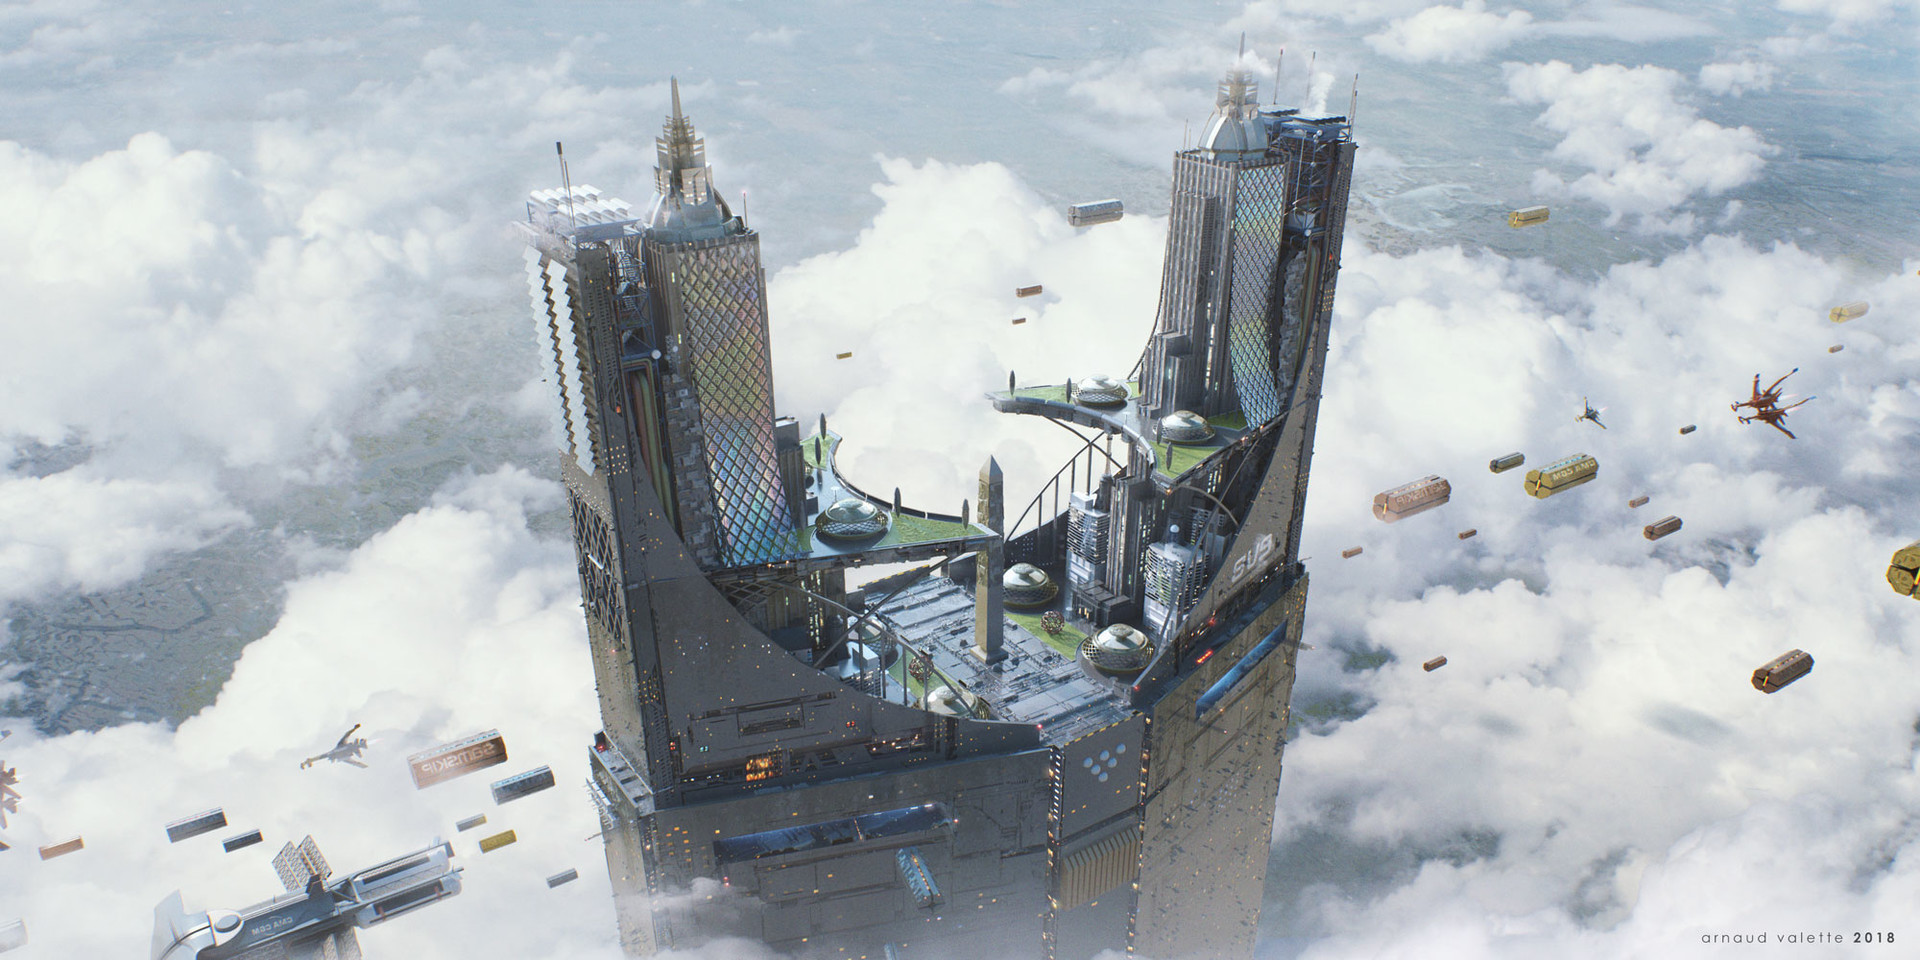 arnaud-valette-cities-03-concept-02-web.